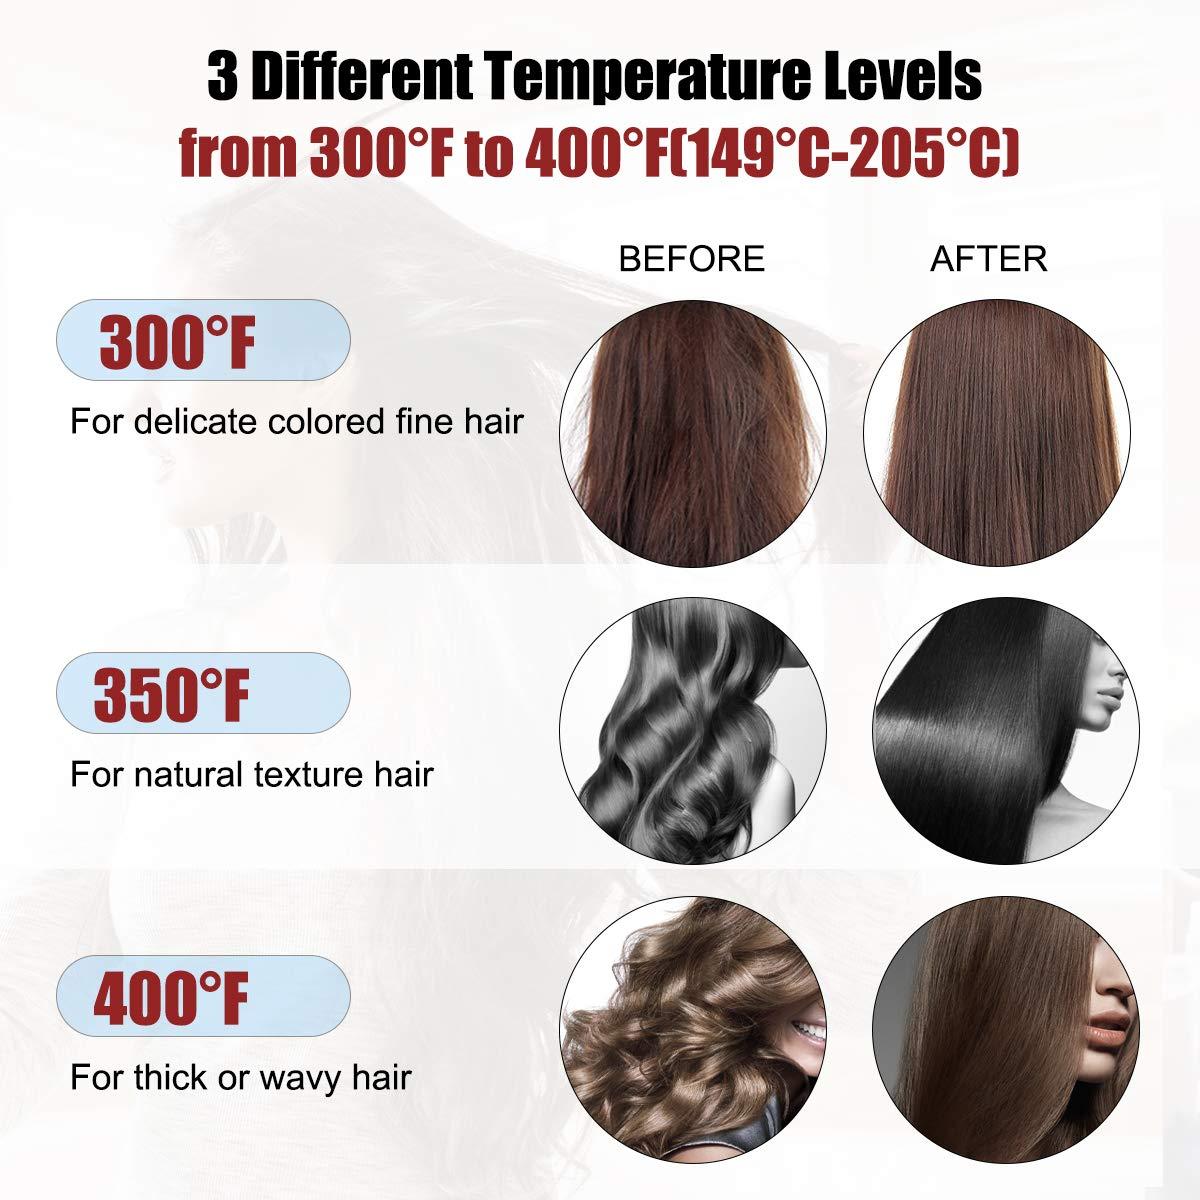 Hair Straightener Brush with Anion Ceramic Iron, HONGNAL Anti-Scald Straightening Comb Fast Heating Long Beard Straighteners Brush with Auto-Off,110-240V,3 Level Temperature,Digital Controls